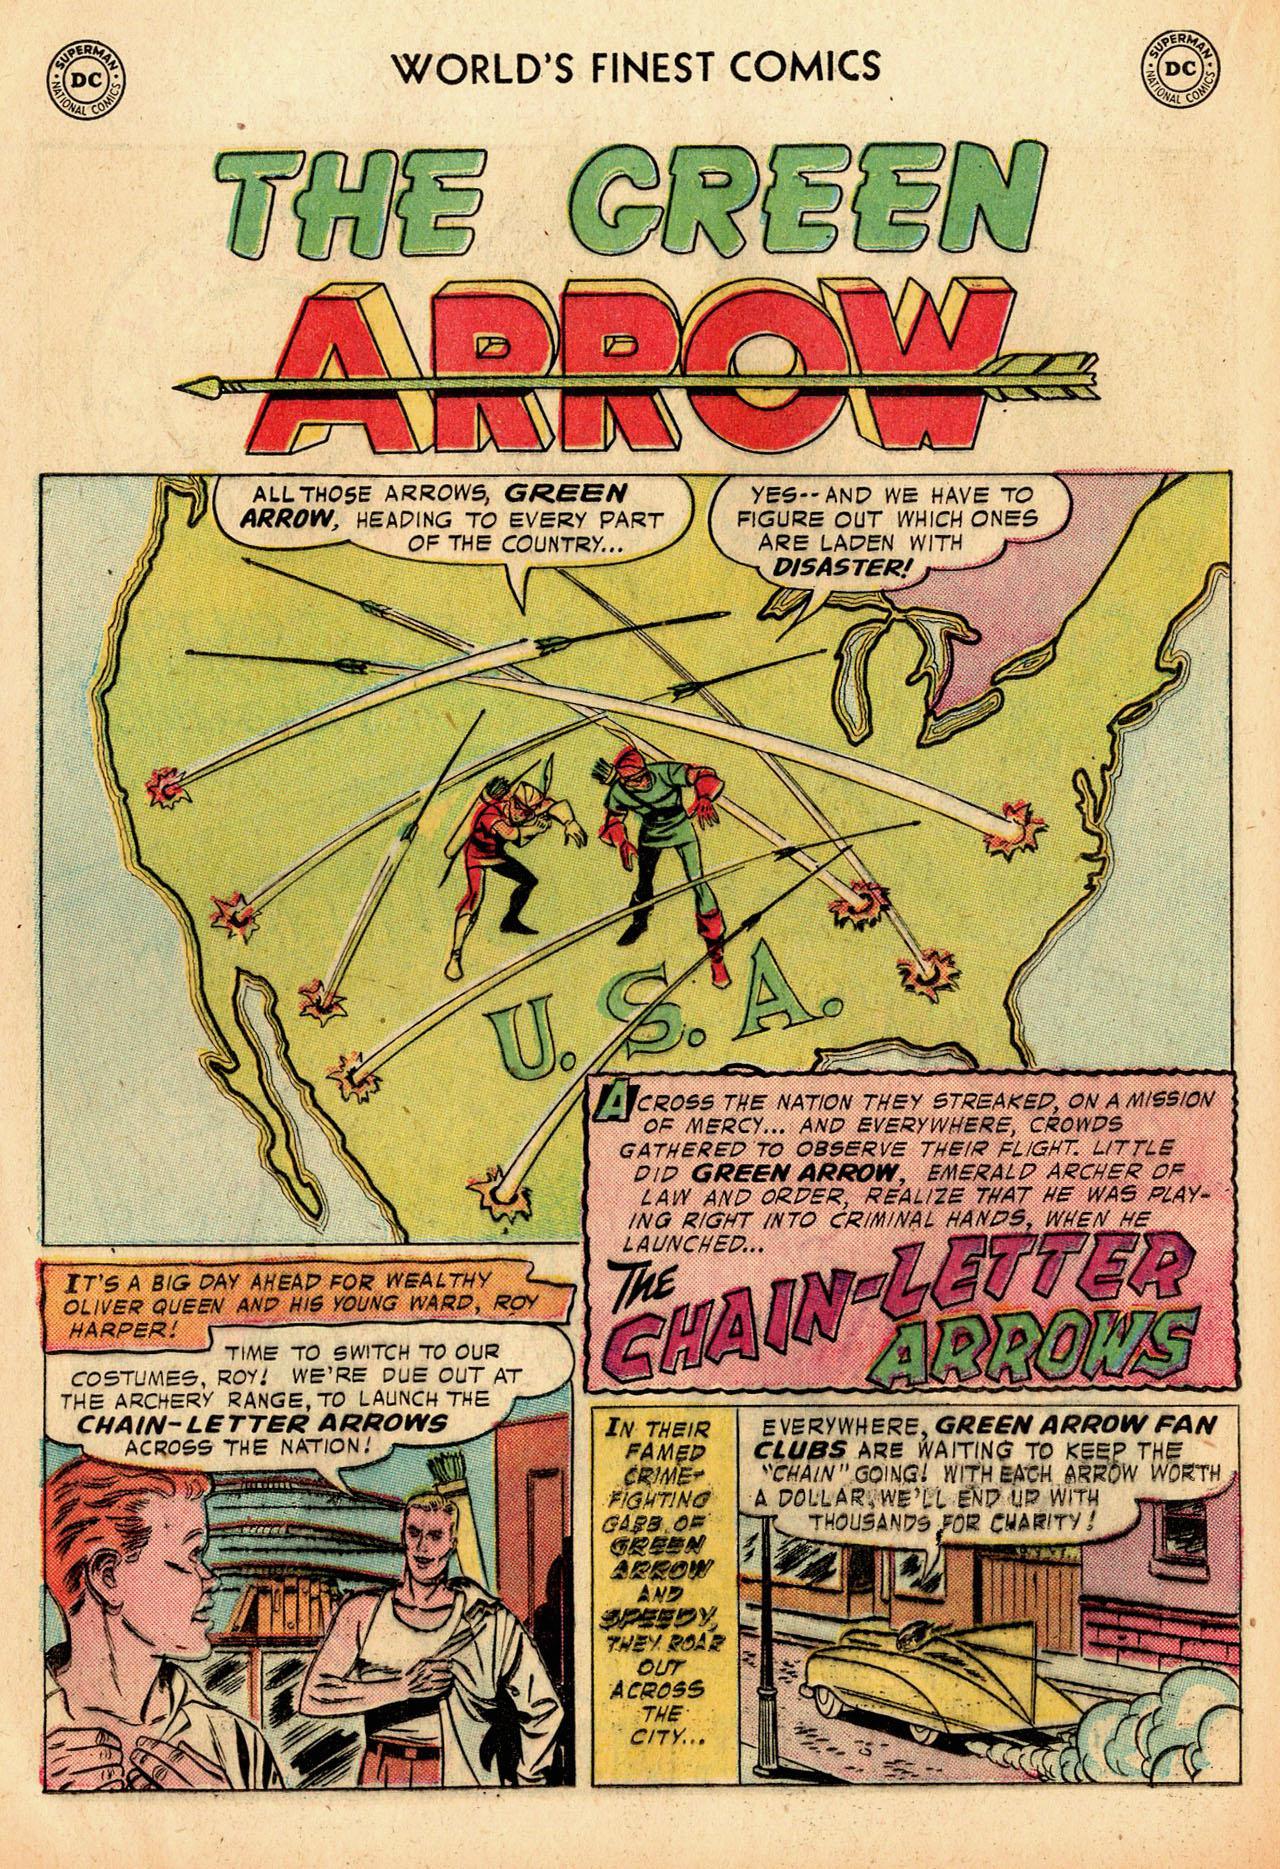 Read online World's Finest Comics comic -  Issue #91 - 18